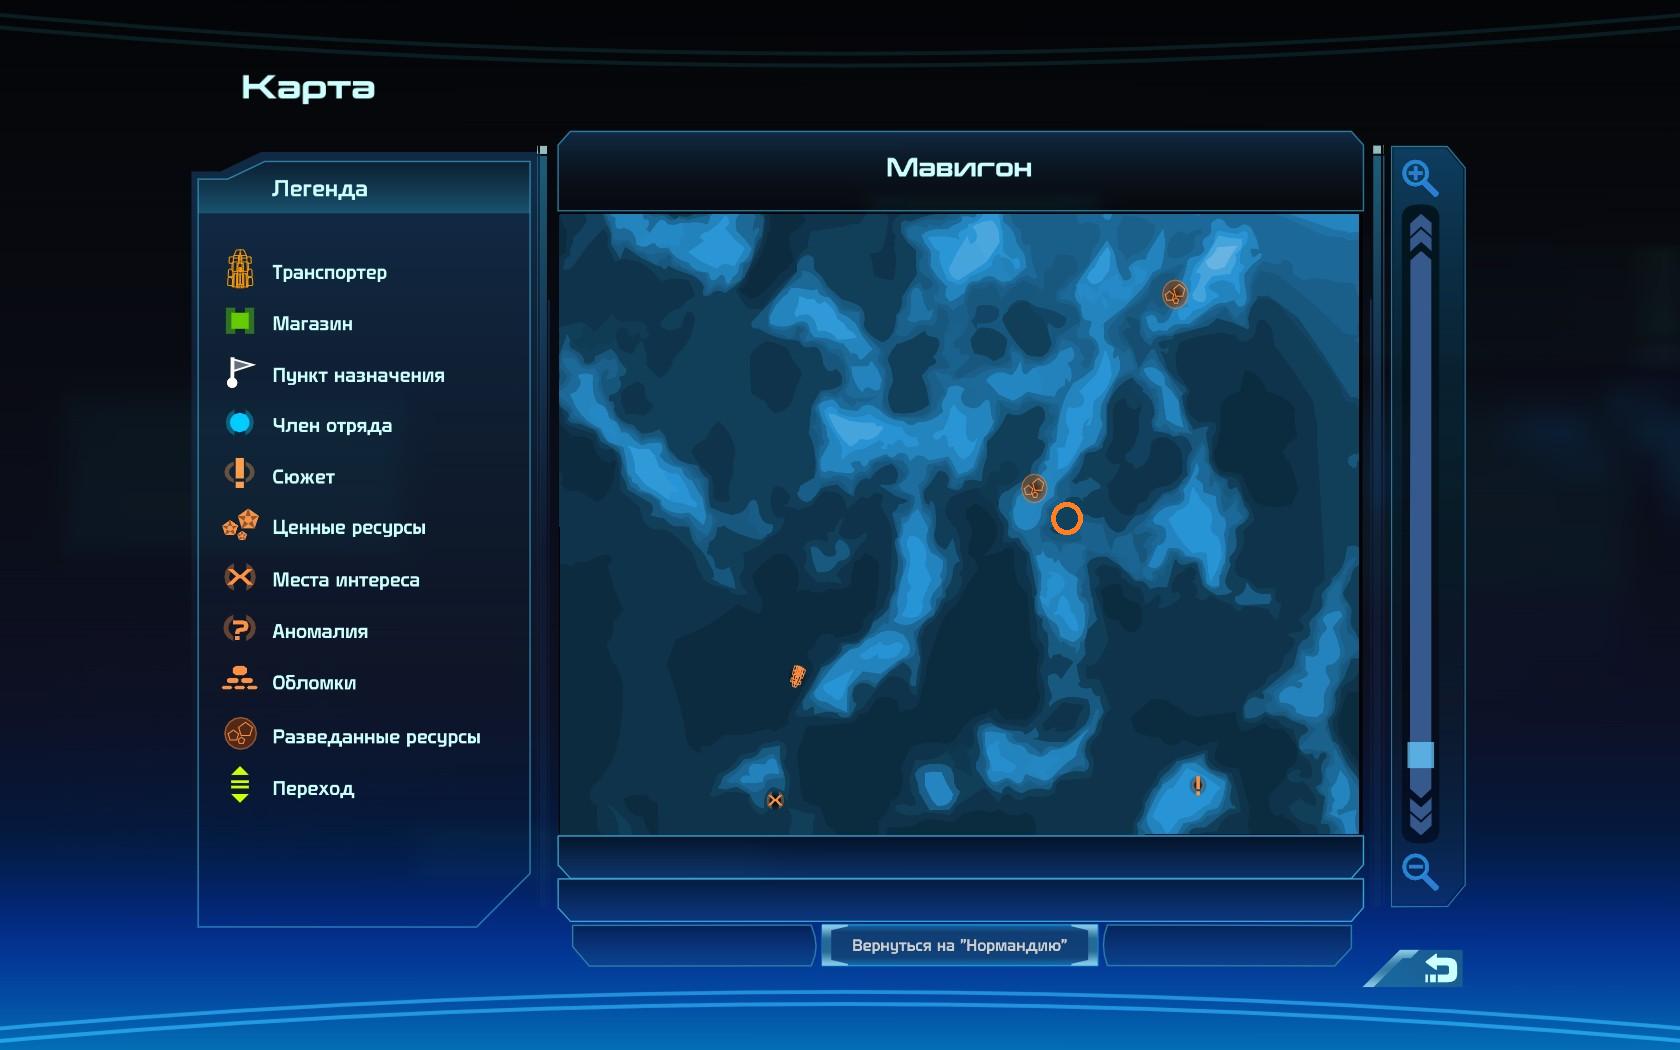 Карта Мавигона